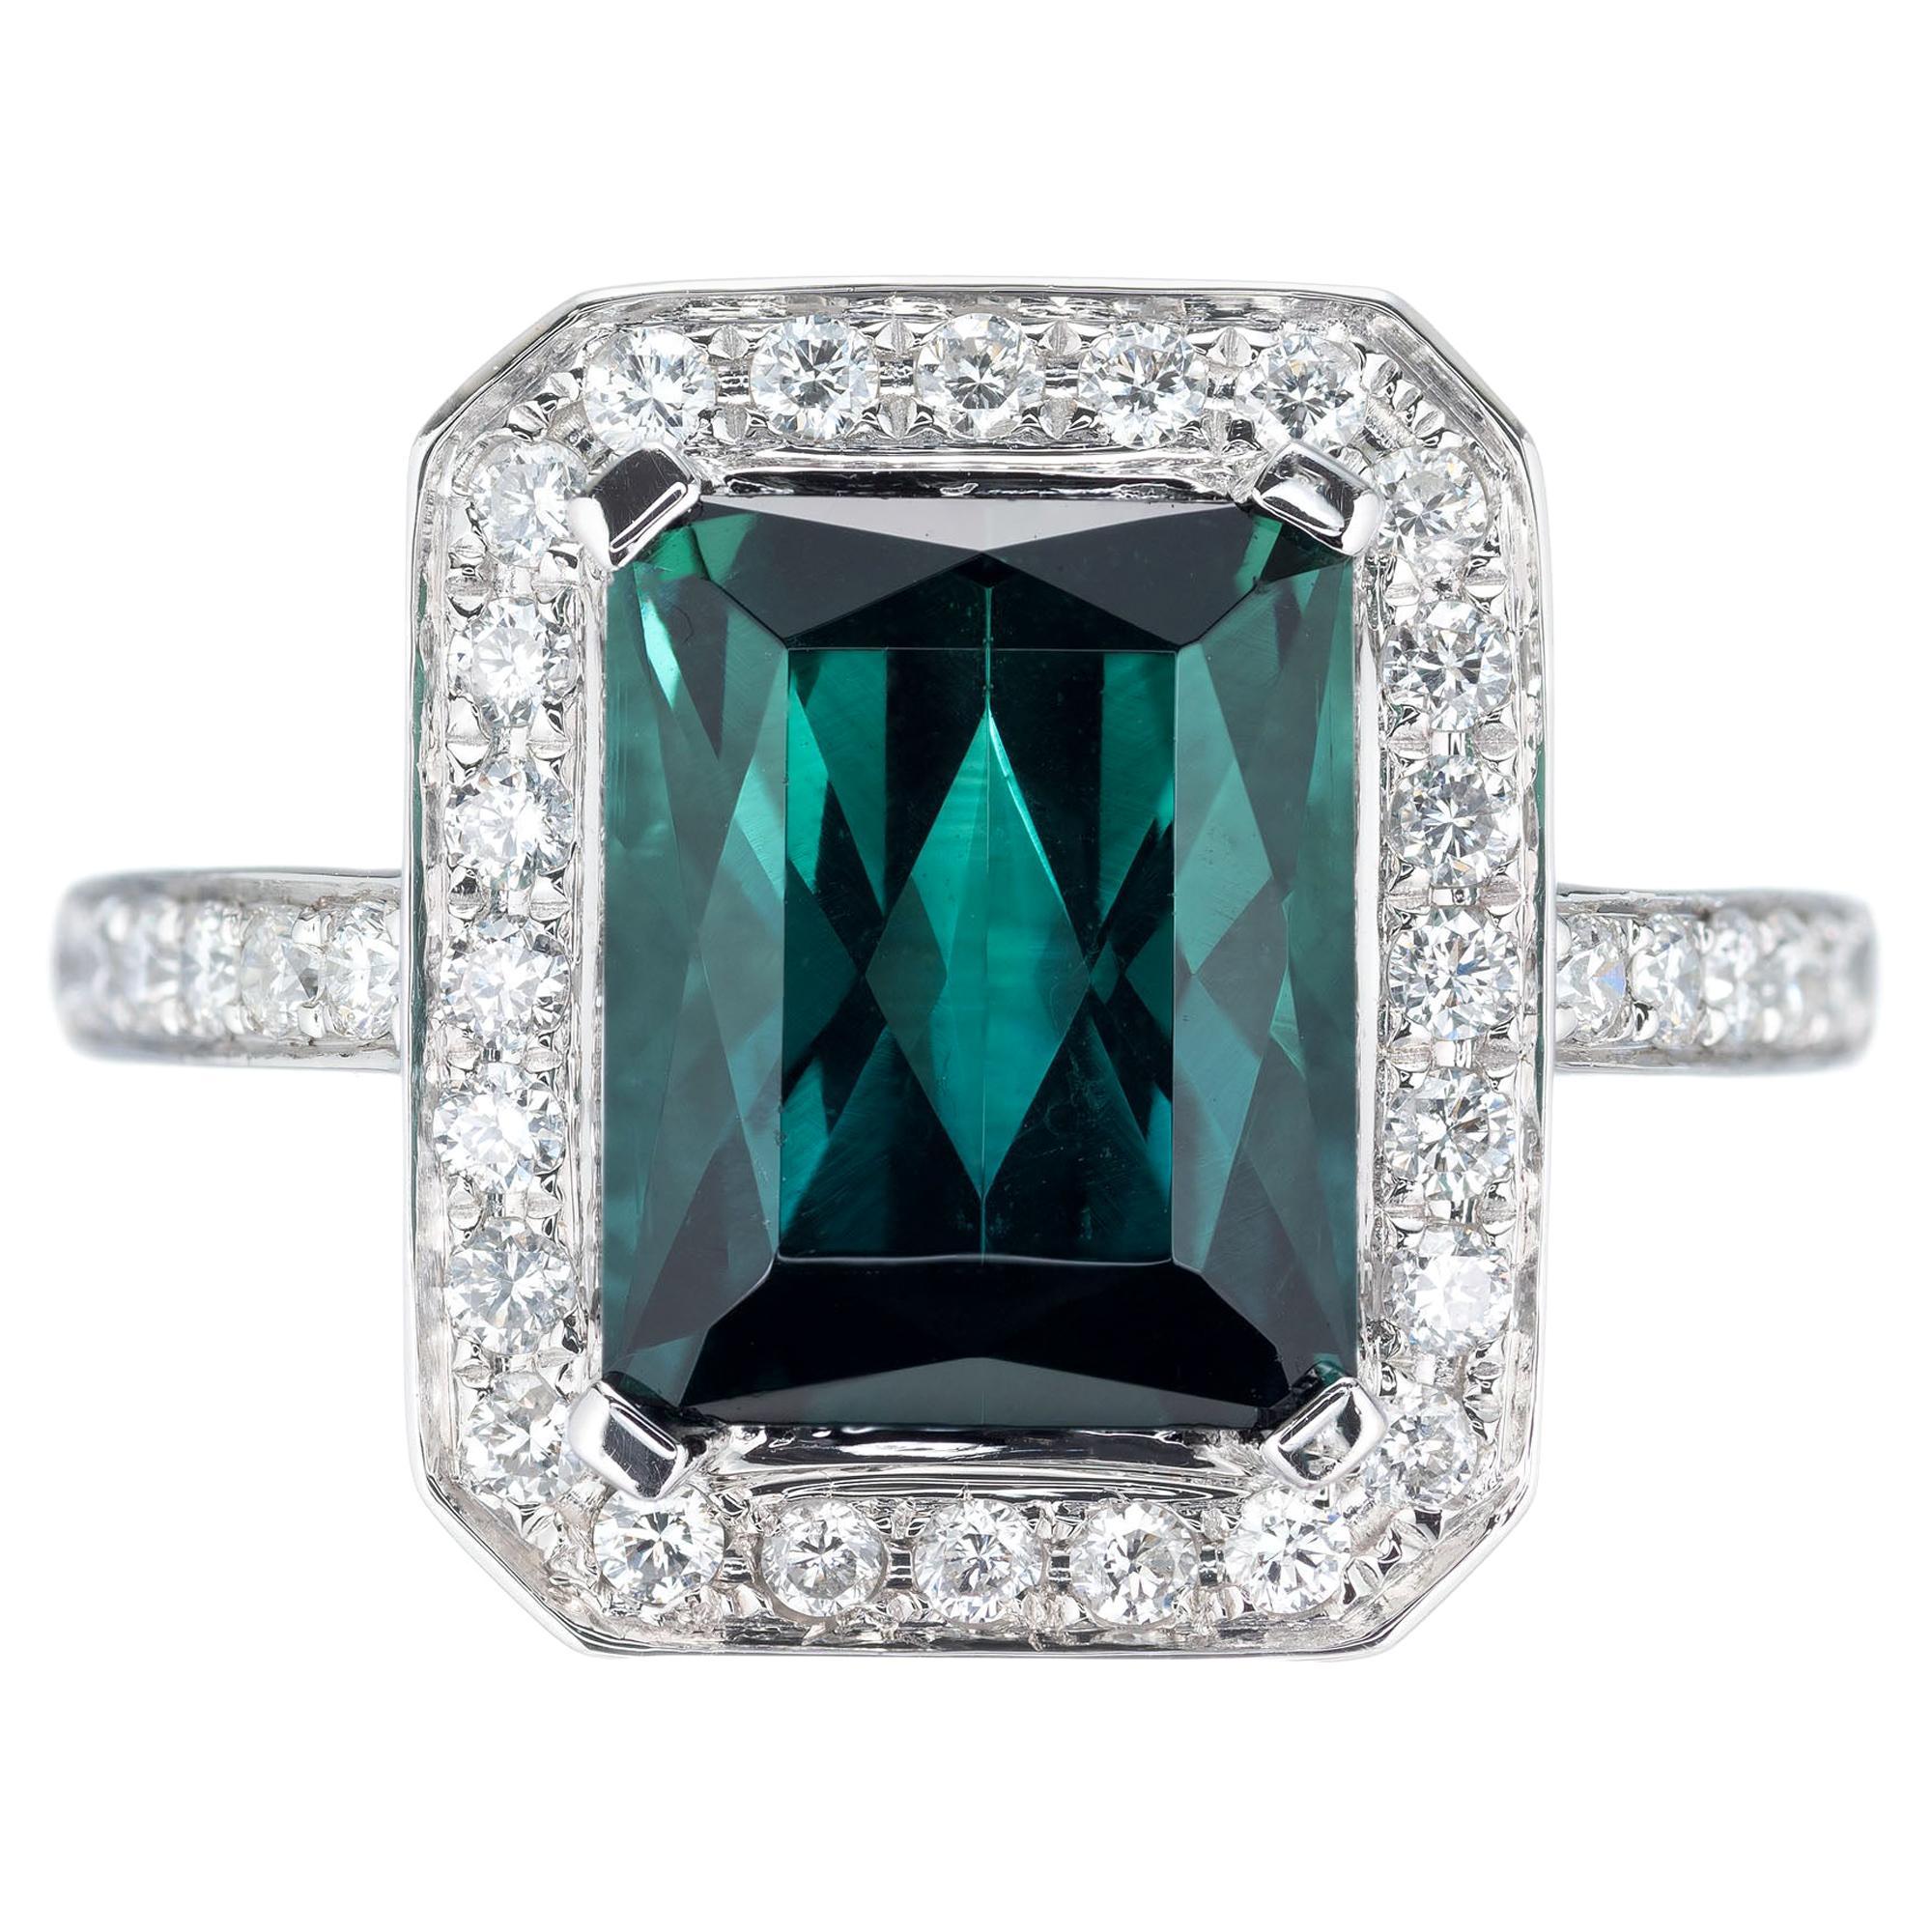 3.65 Carat Green Tourmaline Diamond Halo Gold Engagement Ring